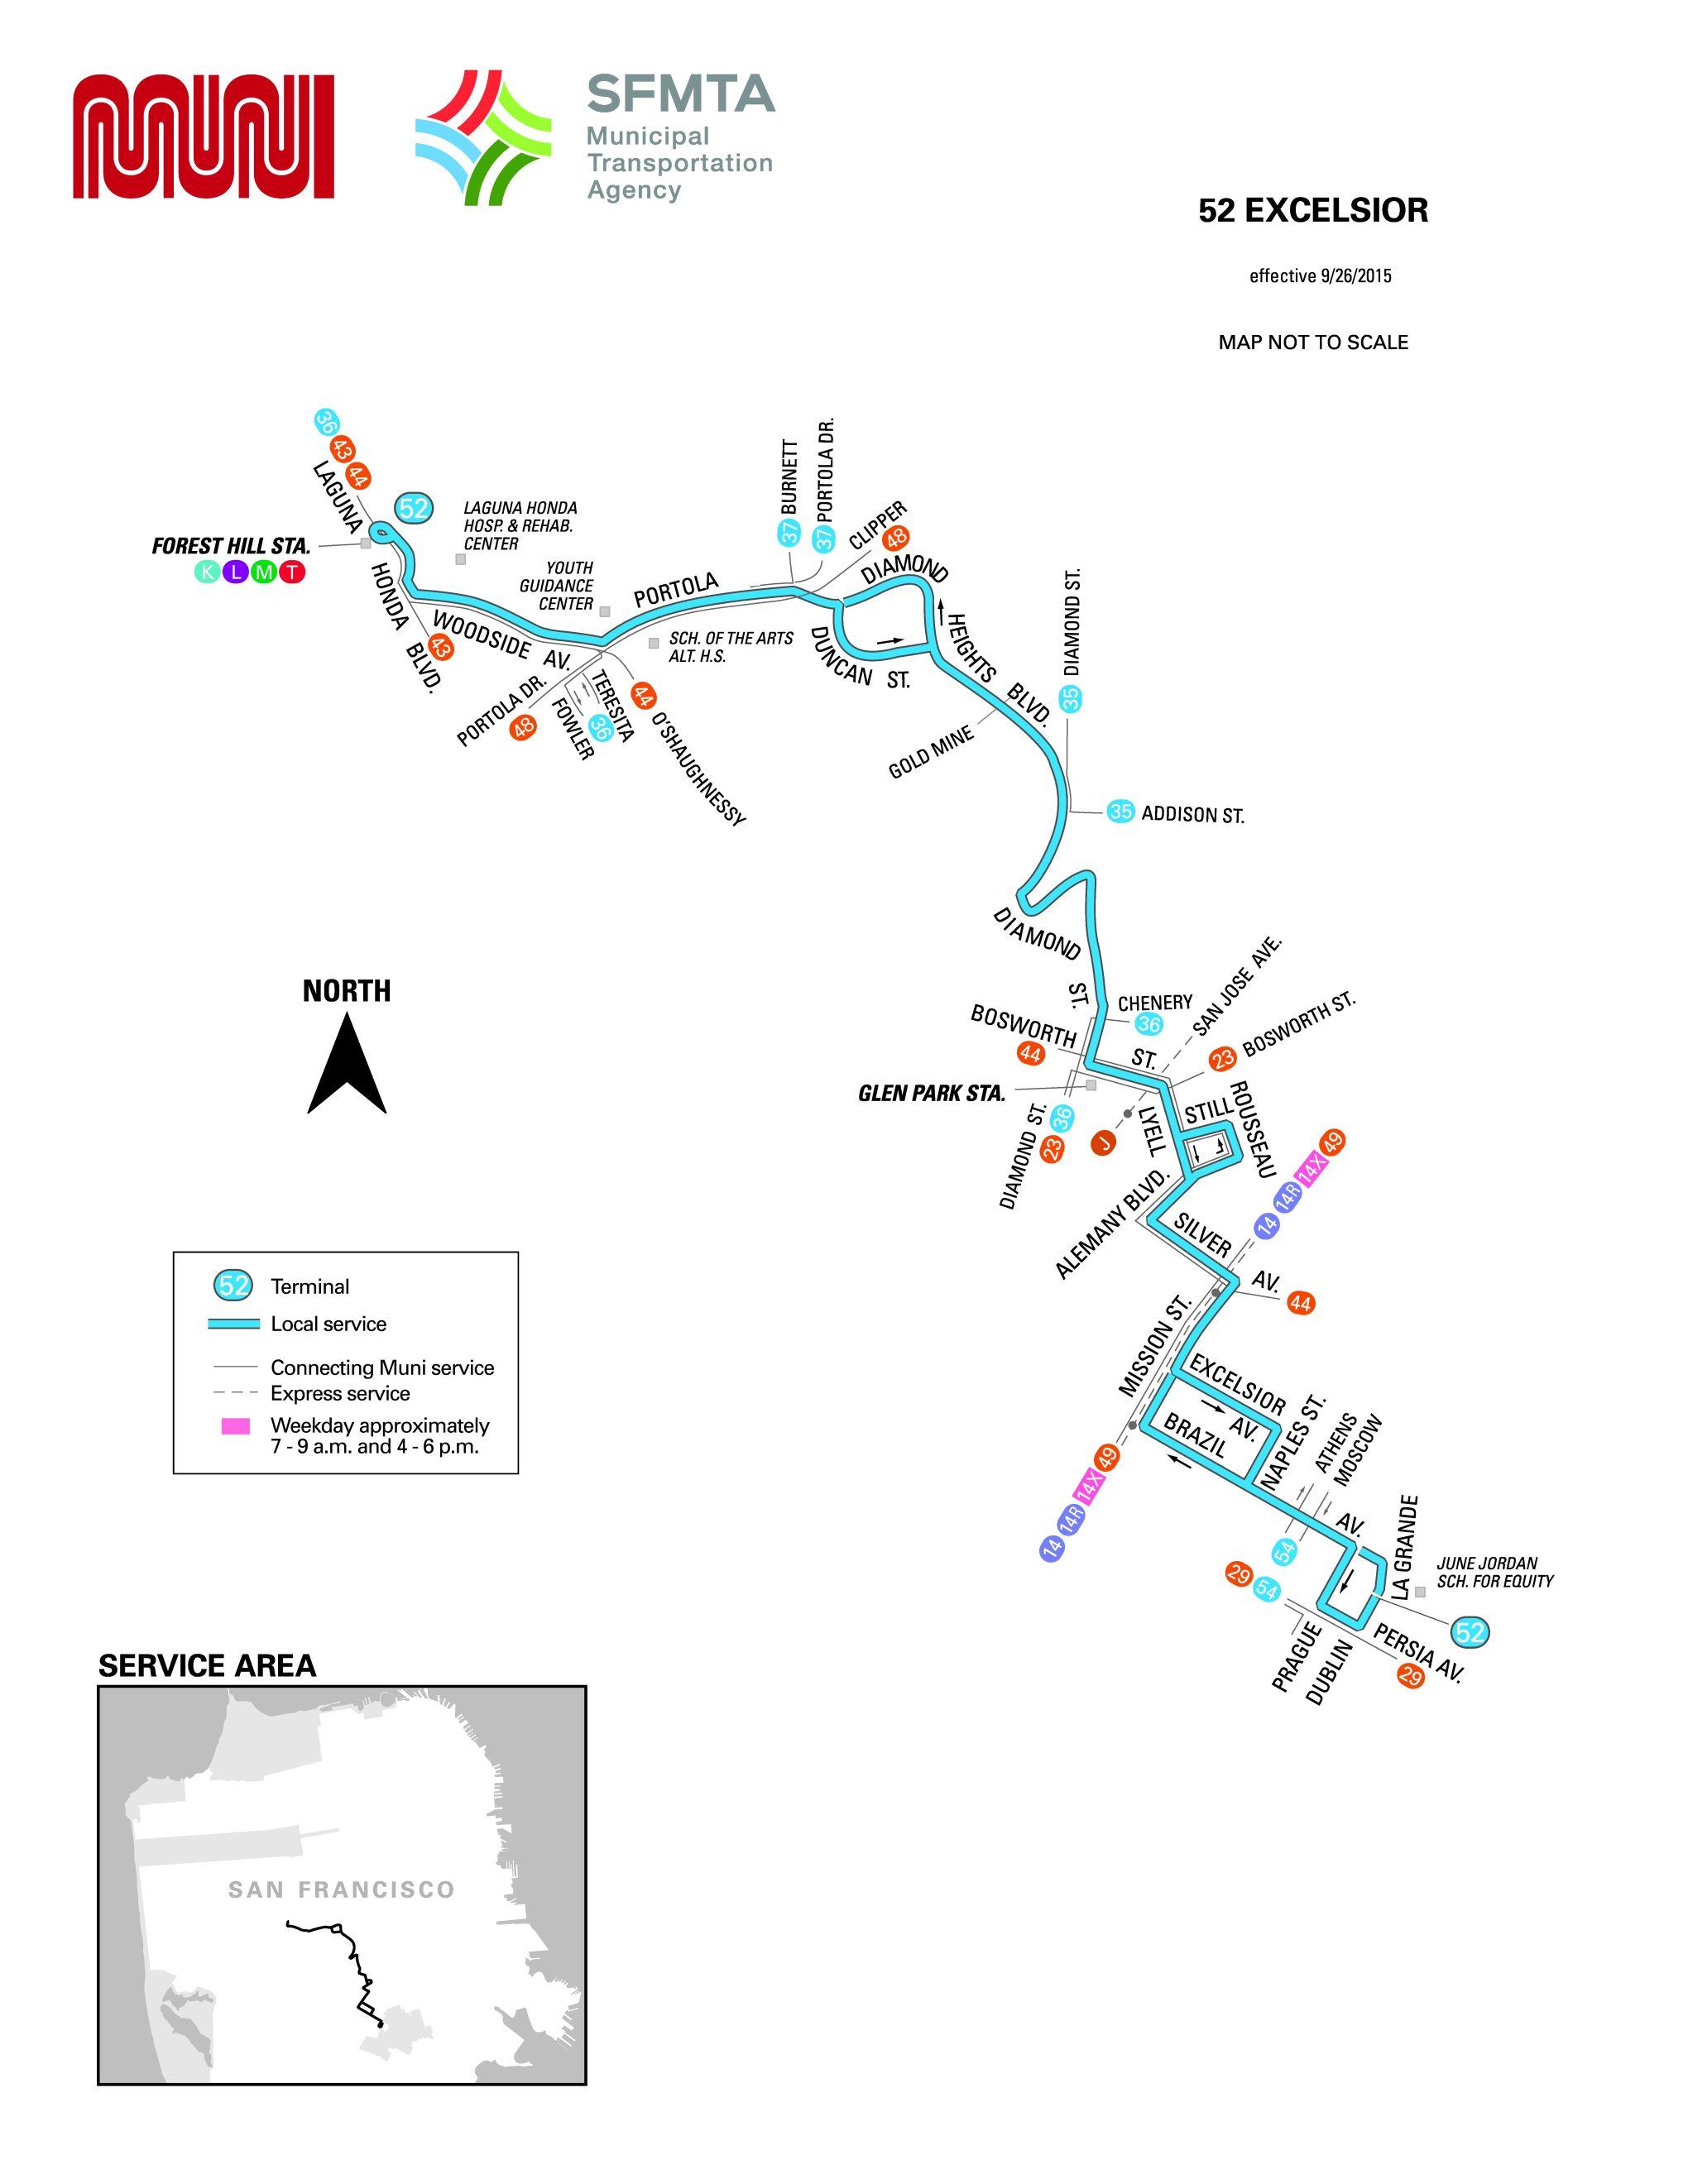 52-excelsior bus schedule - sf muni - sf bay transit